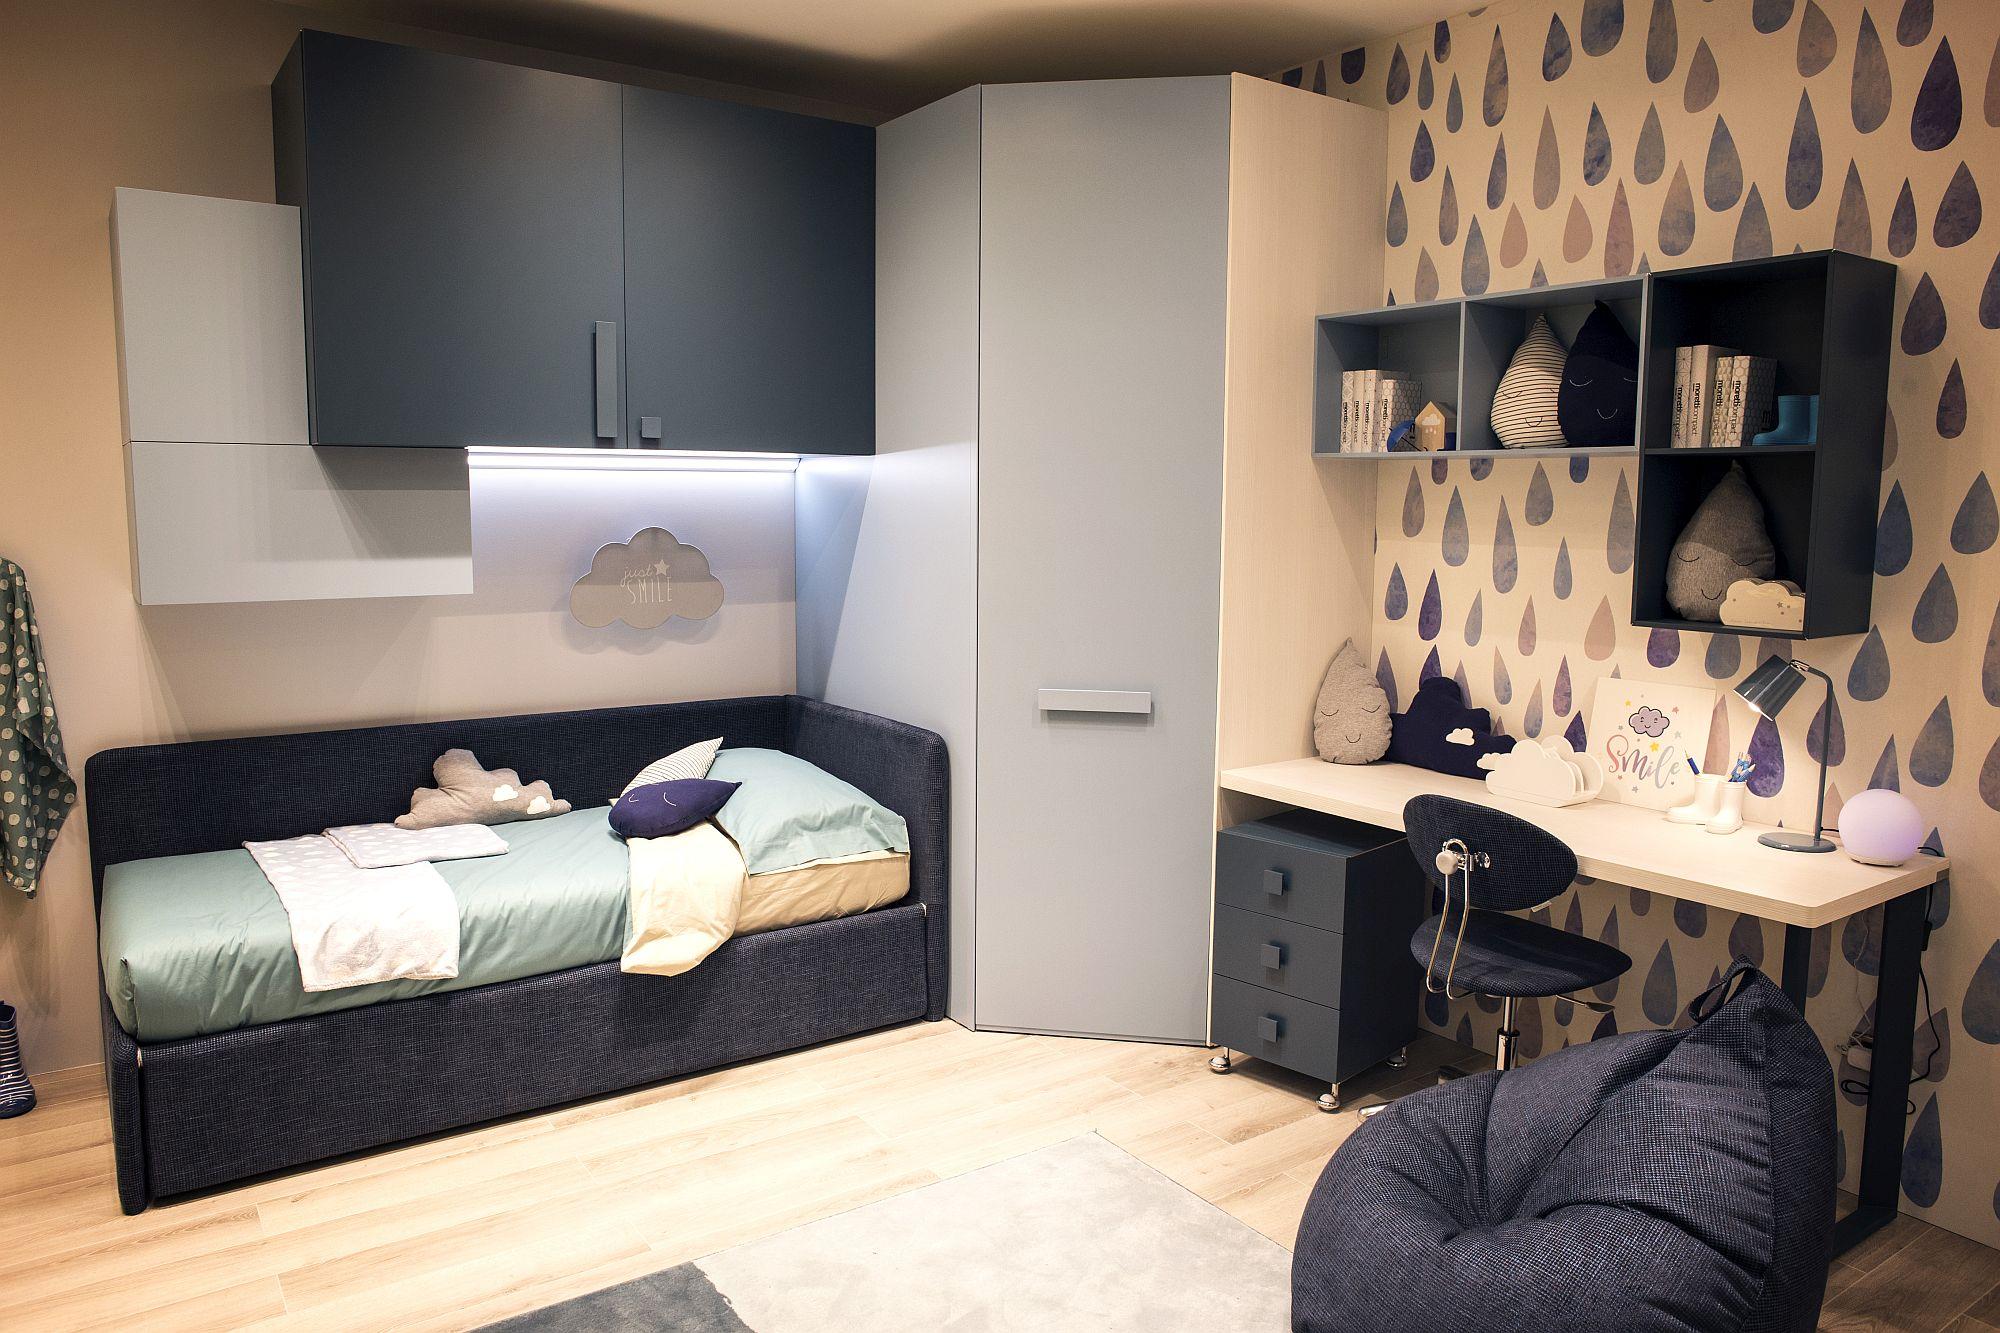 15 ways to maximize corner space in kids bedrooms - Ways to maximize space in a small bedroom decor ...